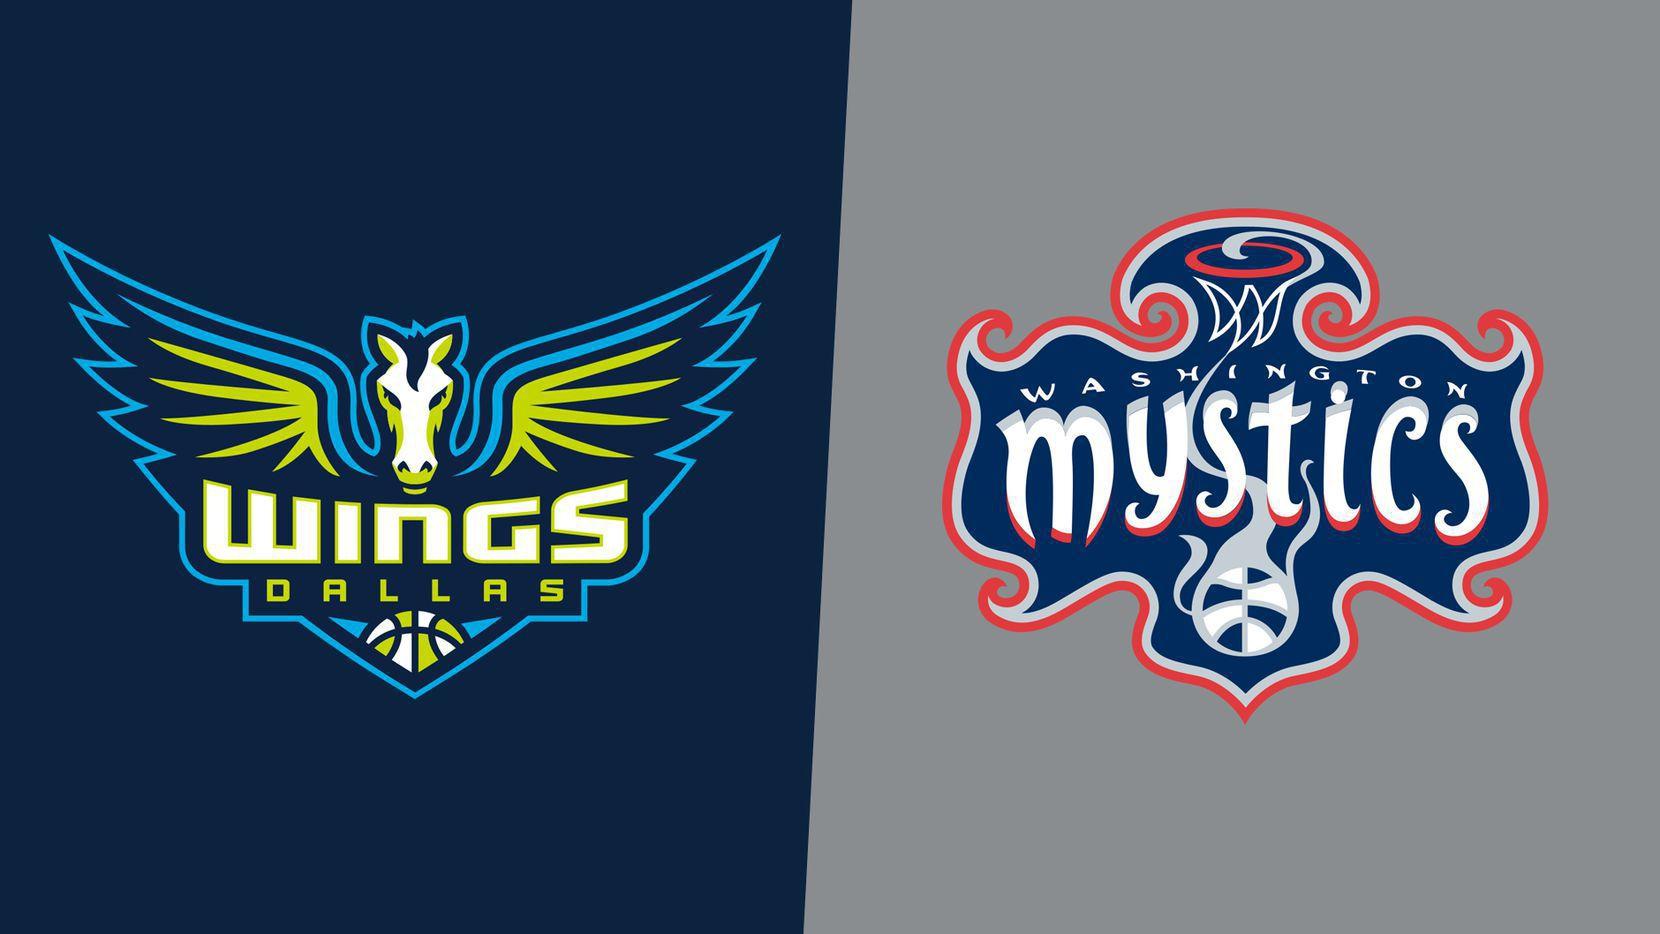 Dallas Wings/Washington Mystics logos